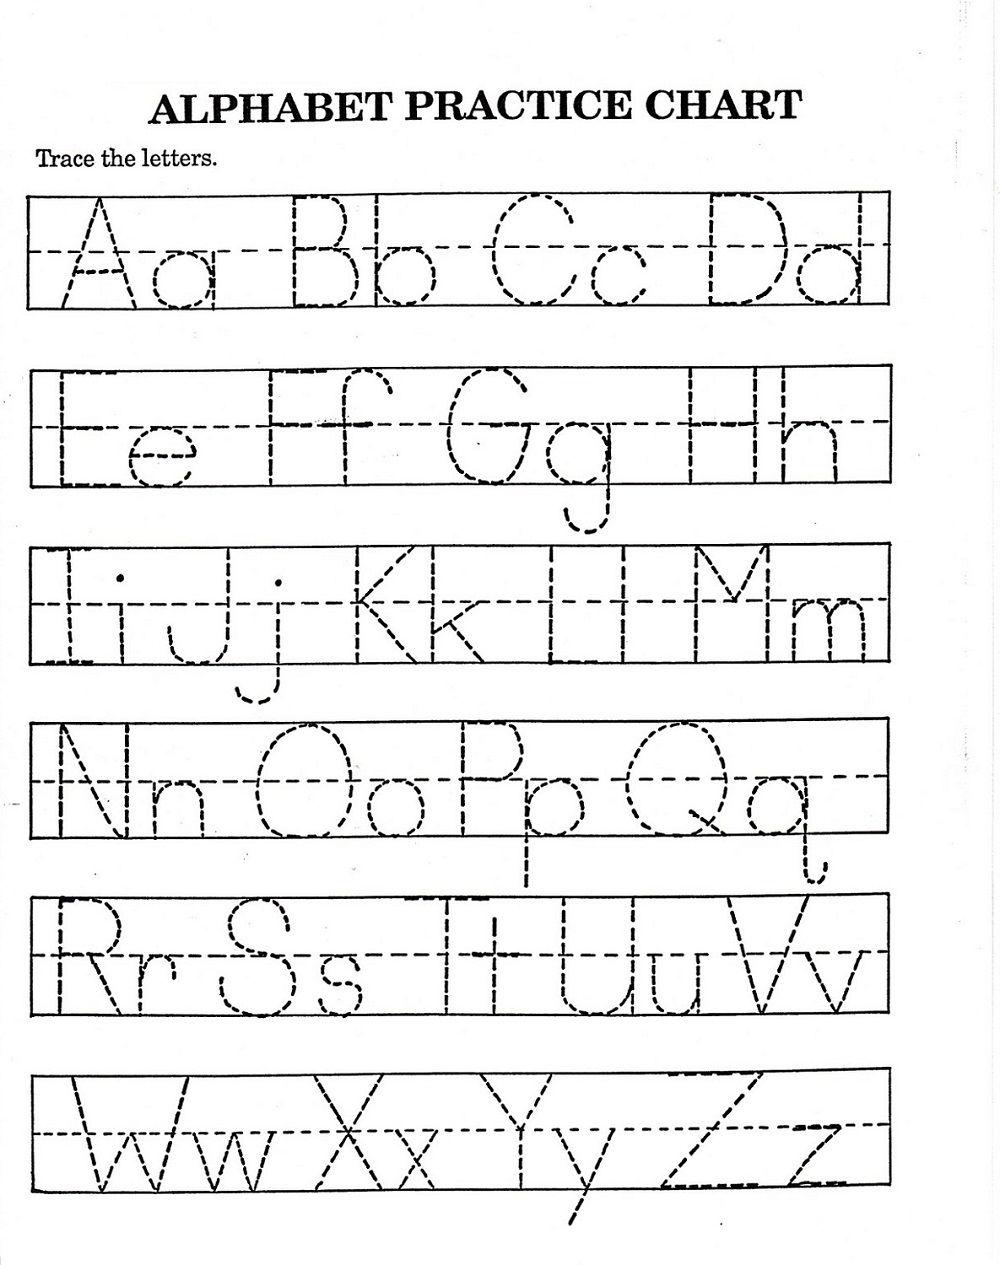 Traceable Alphabet Worksheets A-Z | Alphabet Worksheets Free intended for Alphabet Worksheets A-Z Printable